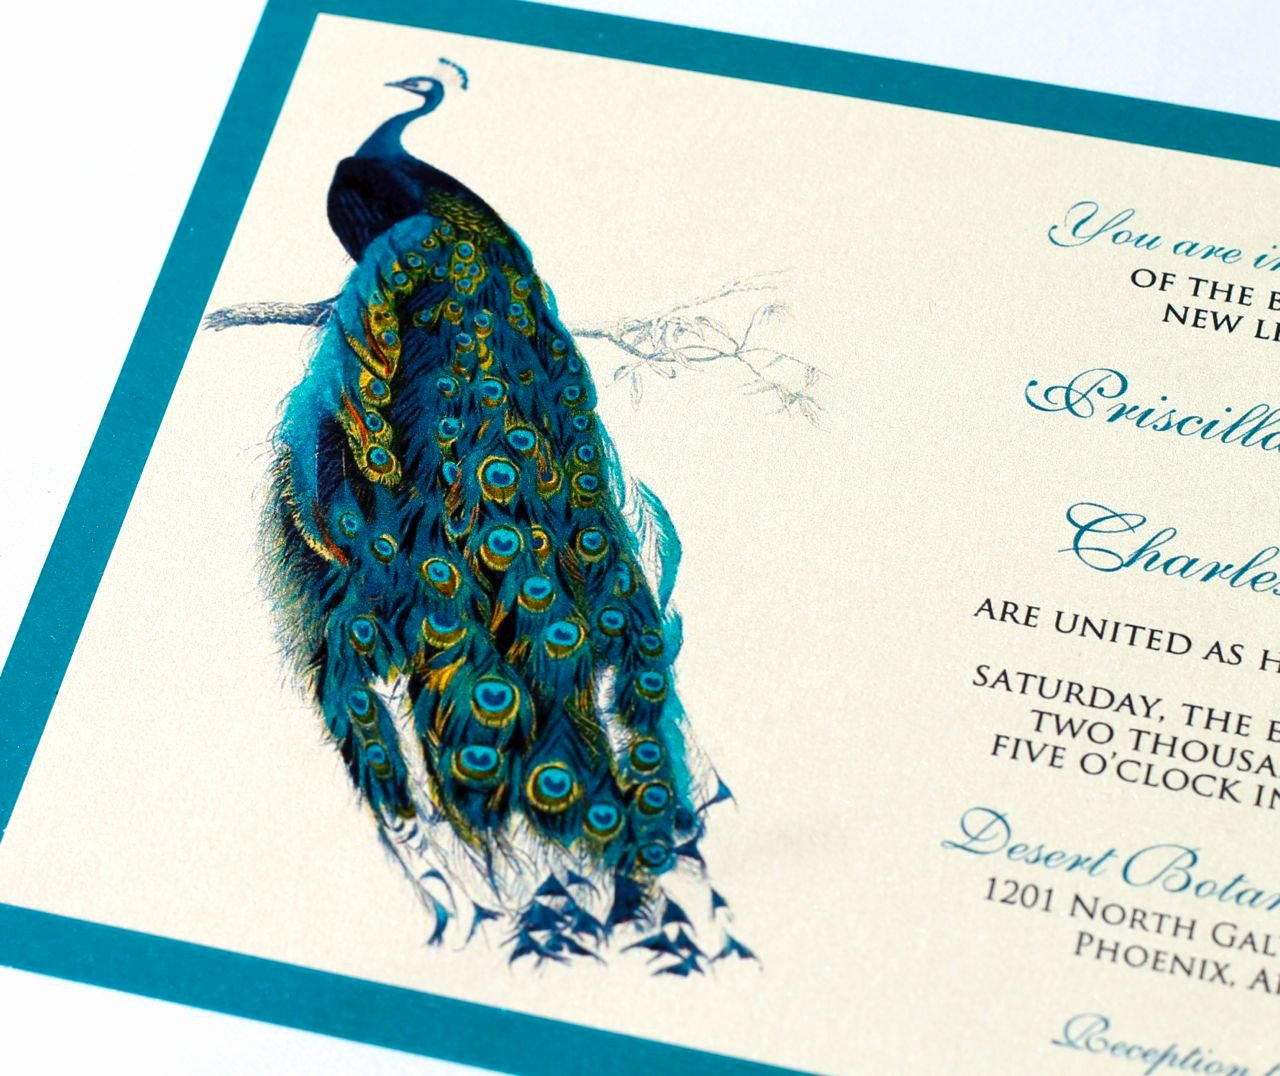 Peacock Invitations Template Free Awesome Priscilla Peacock Wedding Invitation Sample Ivory Ecru